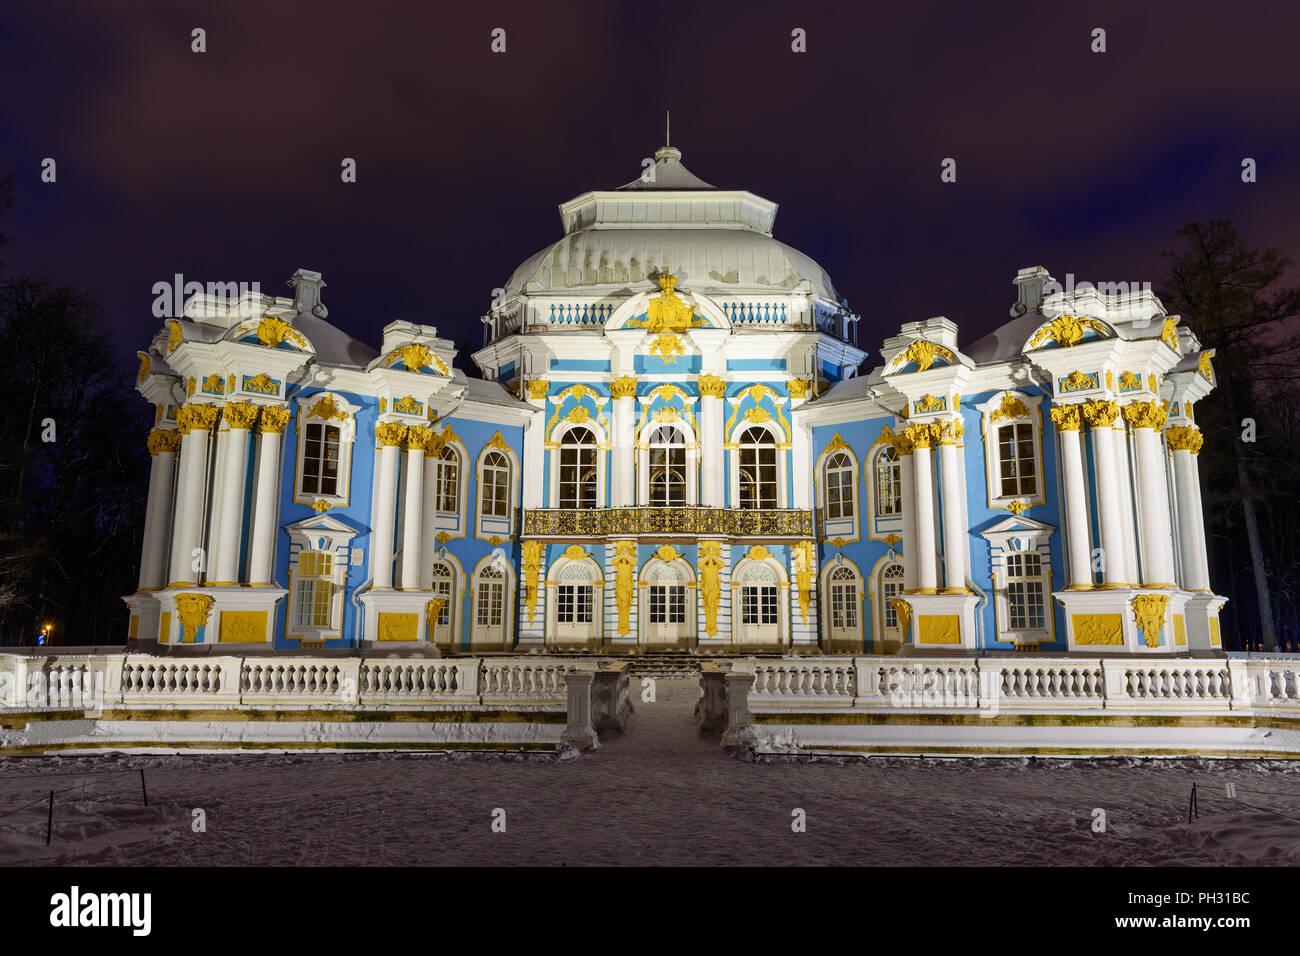 Pavilion Hermitage in Catherine park at Tsarskoe Selo at night in winter. Pushkin town. Saint Petersburg. Russia - Stock Image